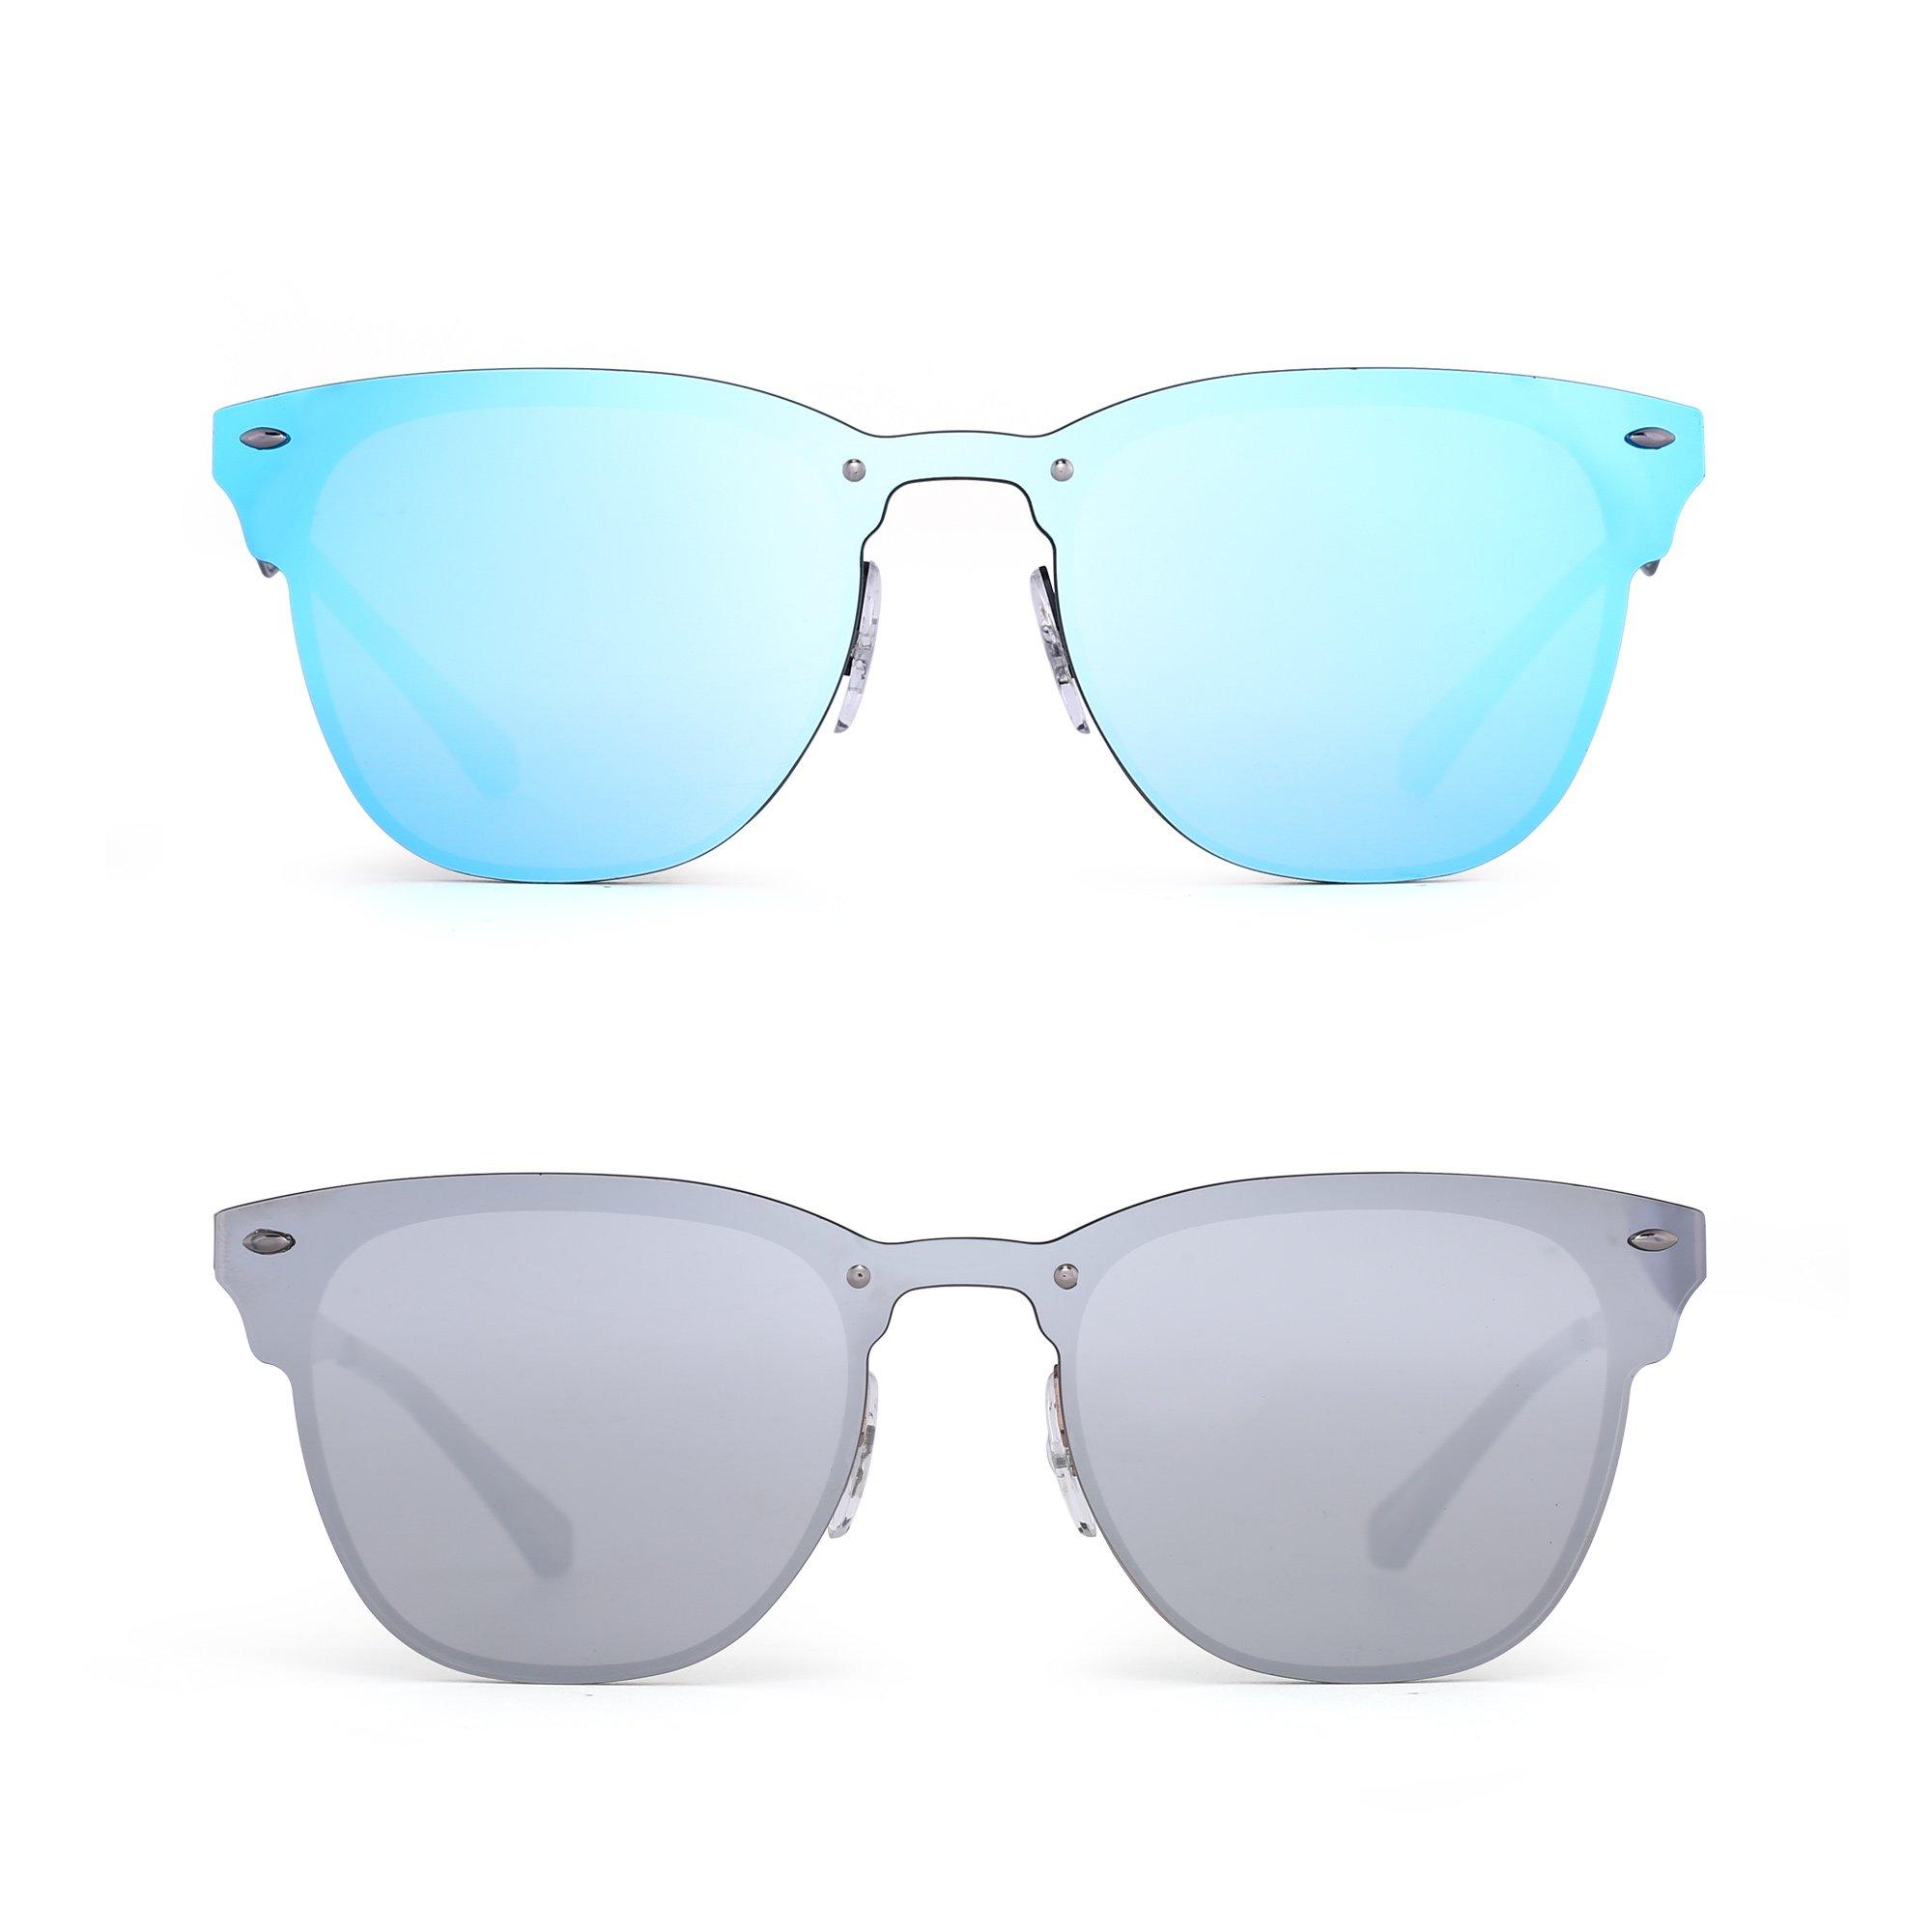 Rimless Mirrored Sunglasses One Piece Horned Rimmed Metal Eyeglasses Women Men 2 Pack (Blue & Silver)